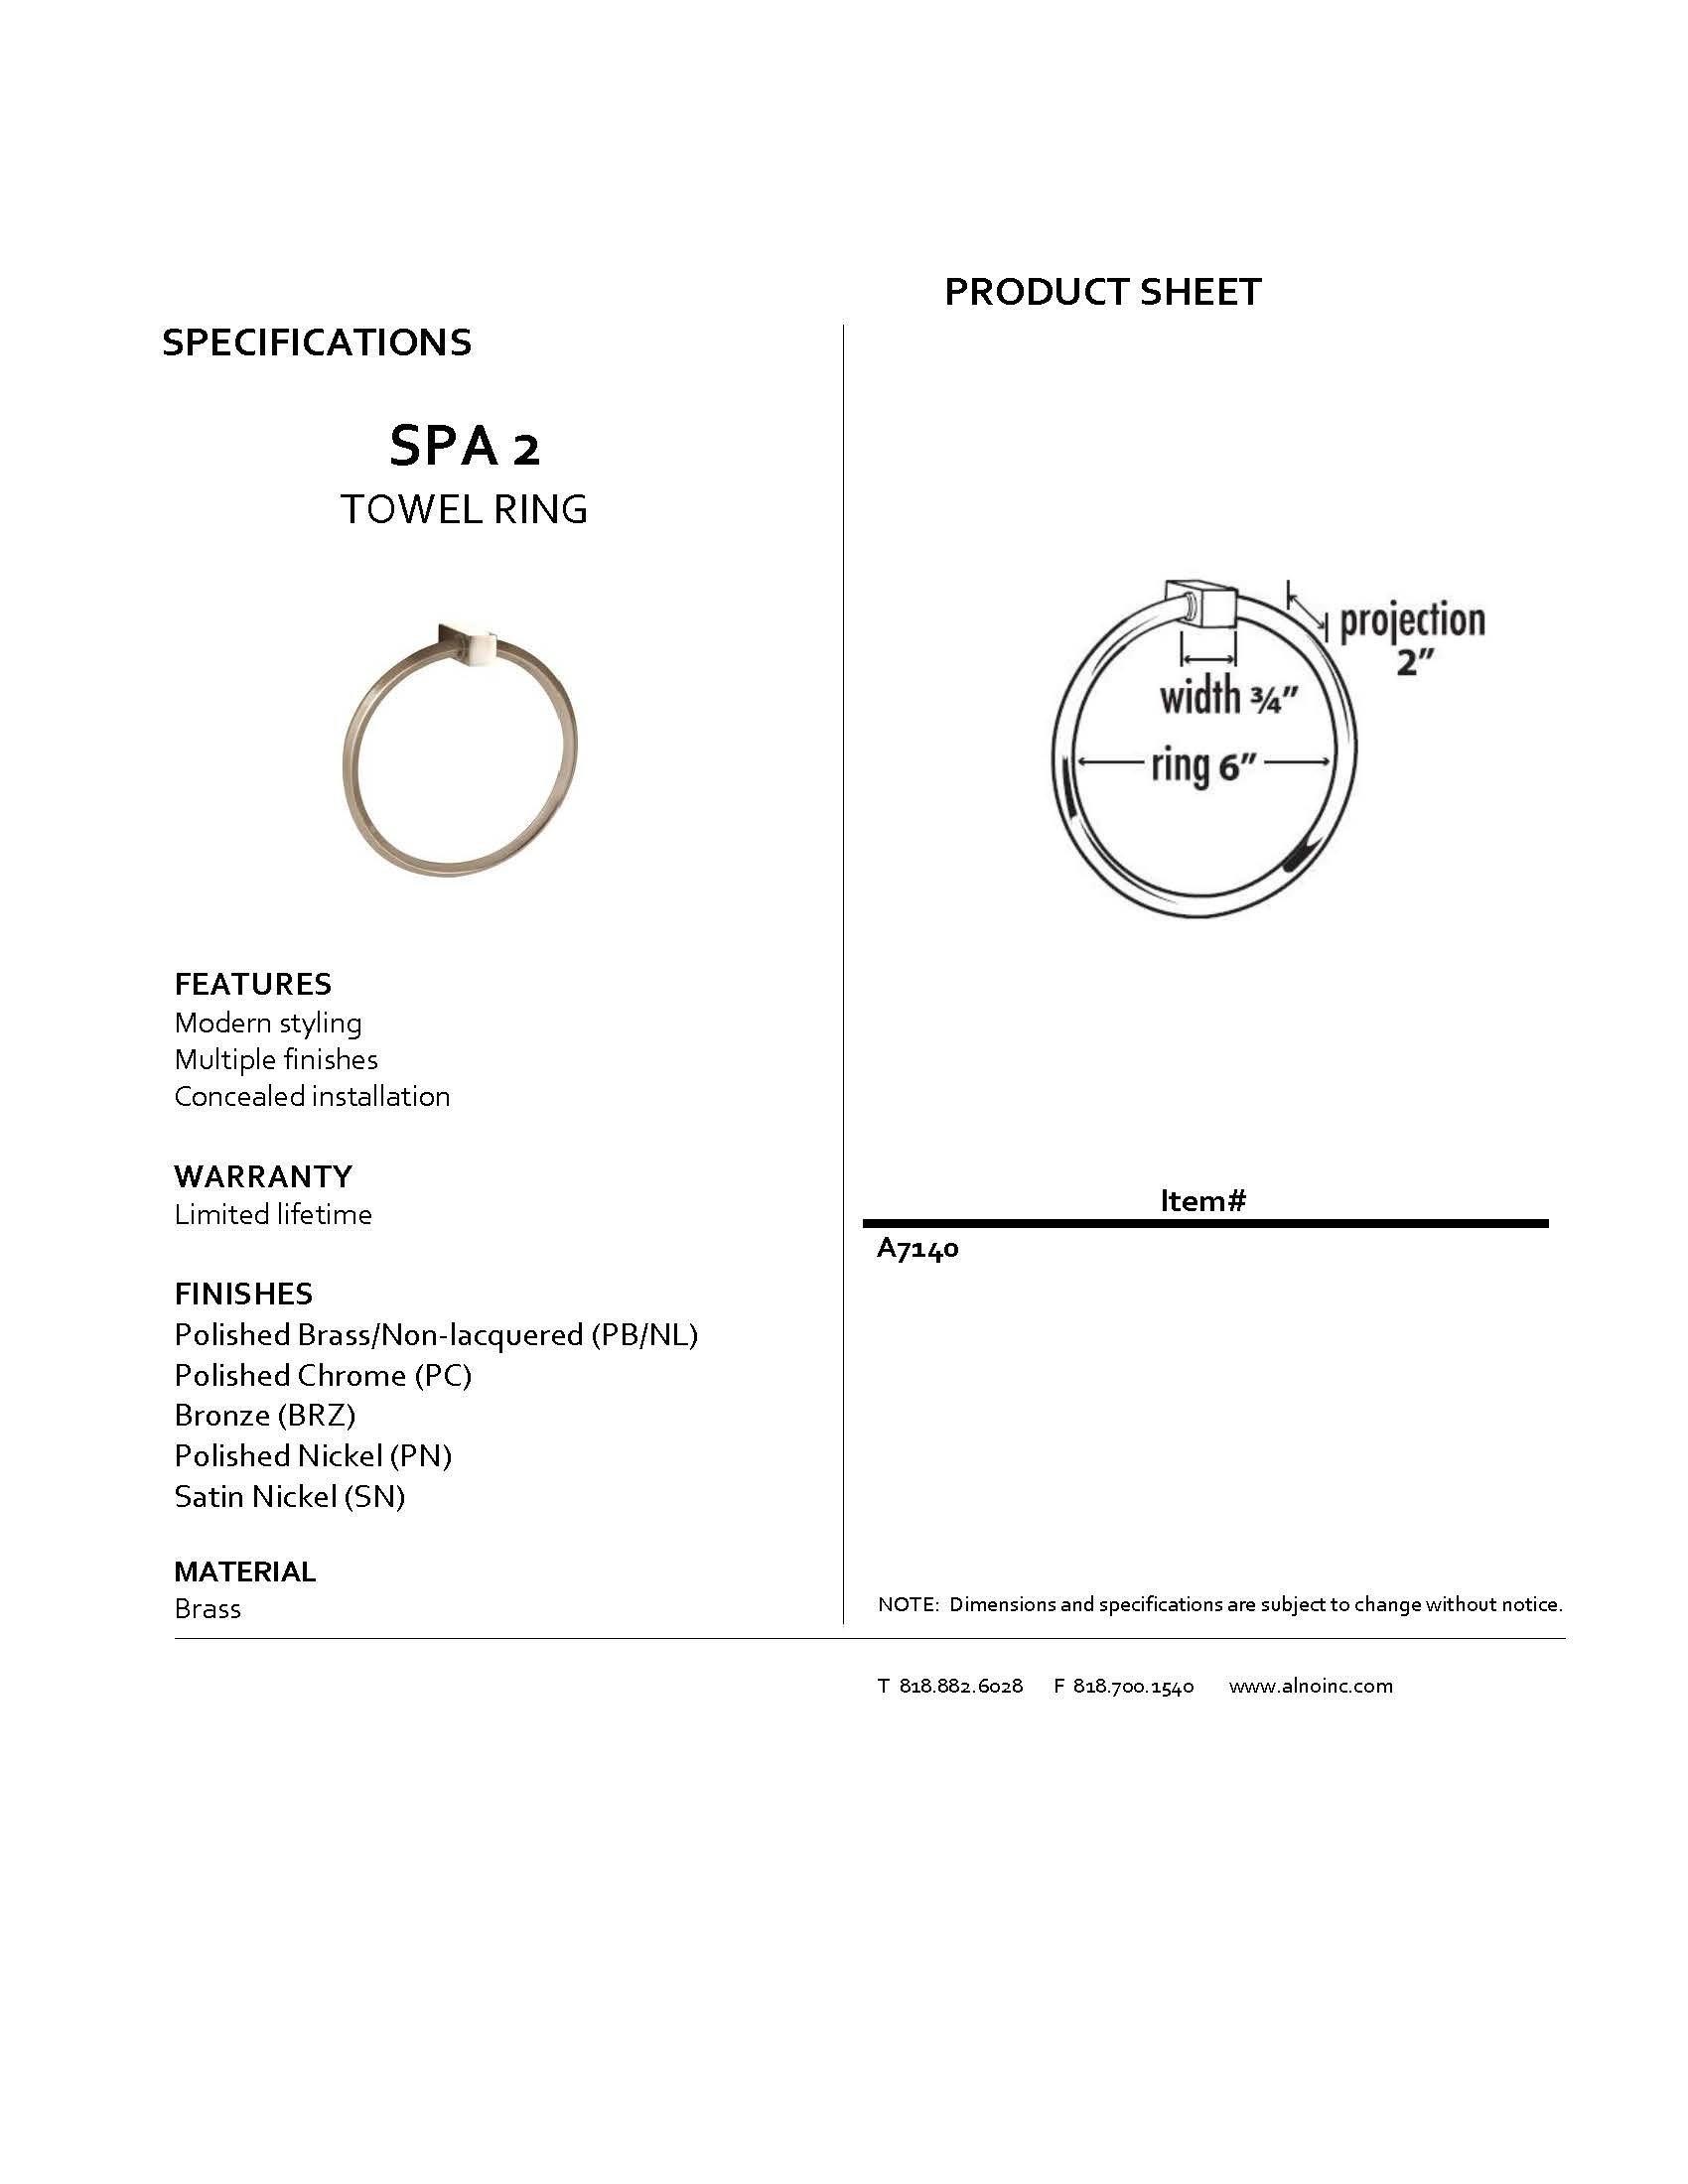 Alno A7140-PC Spa 2 Modern Towel Rings, Polished Chrome, 6''